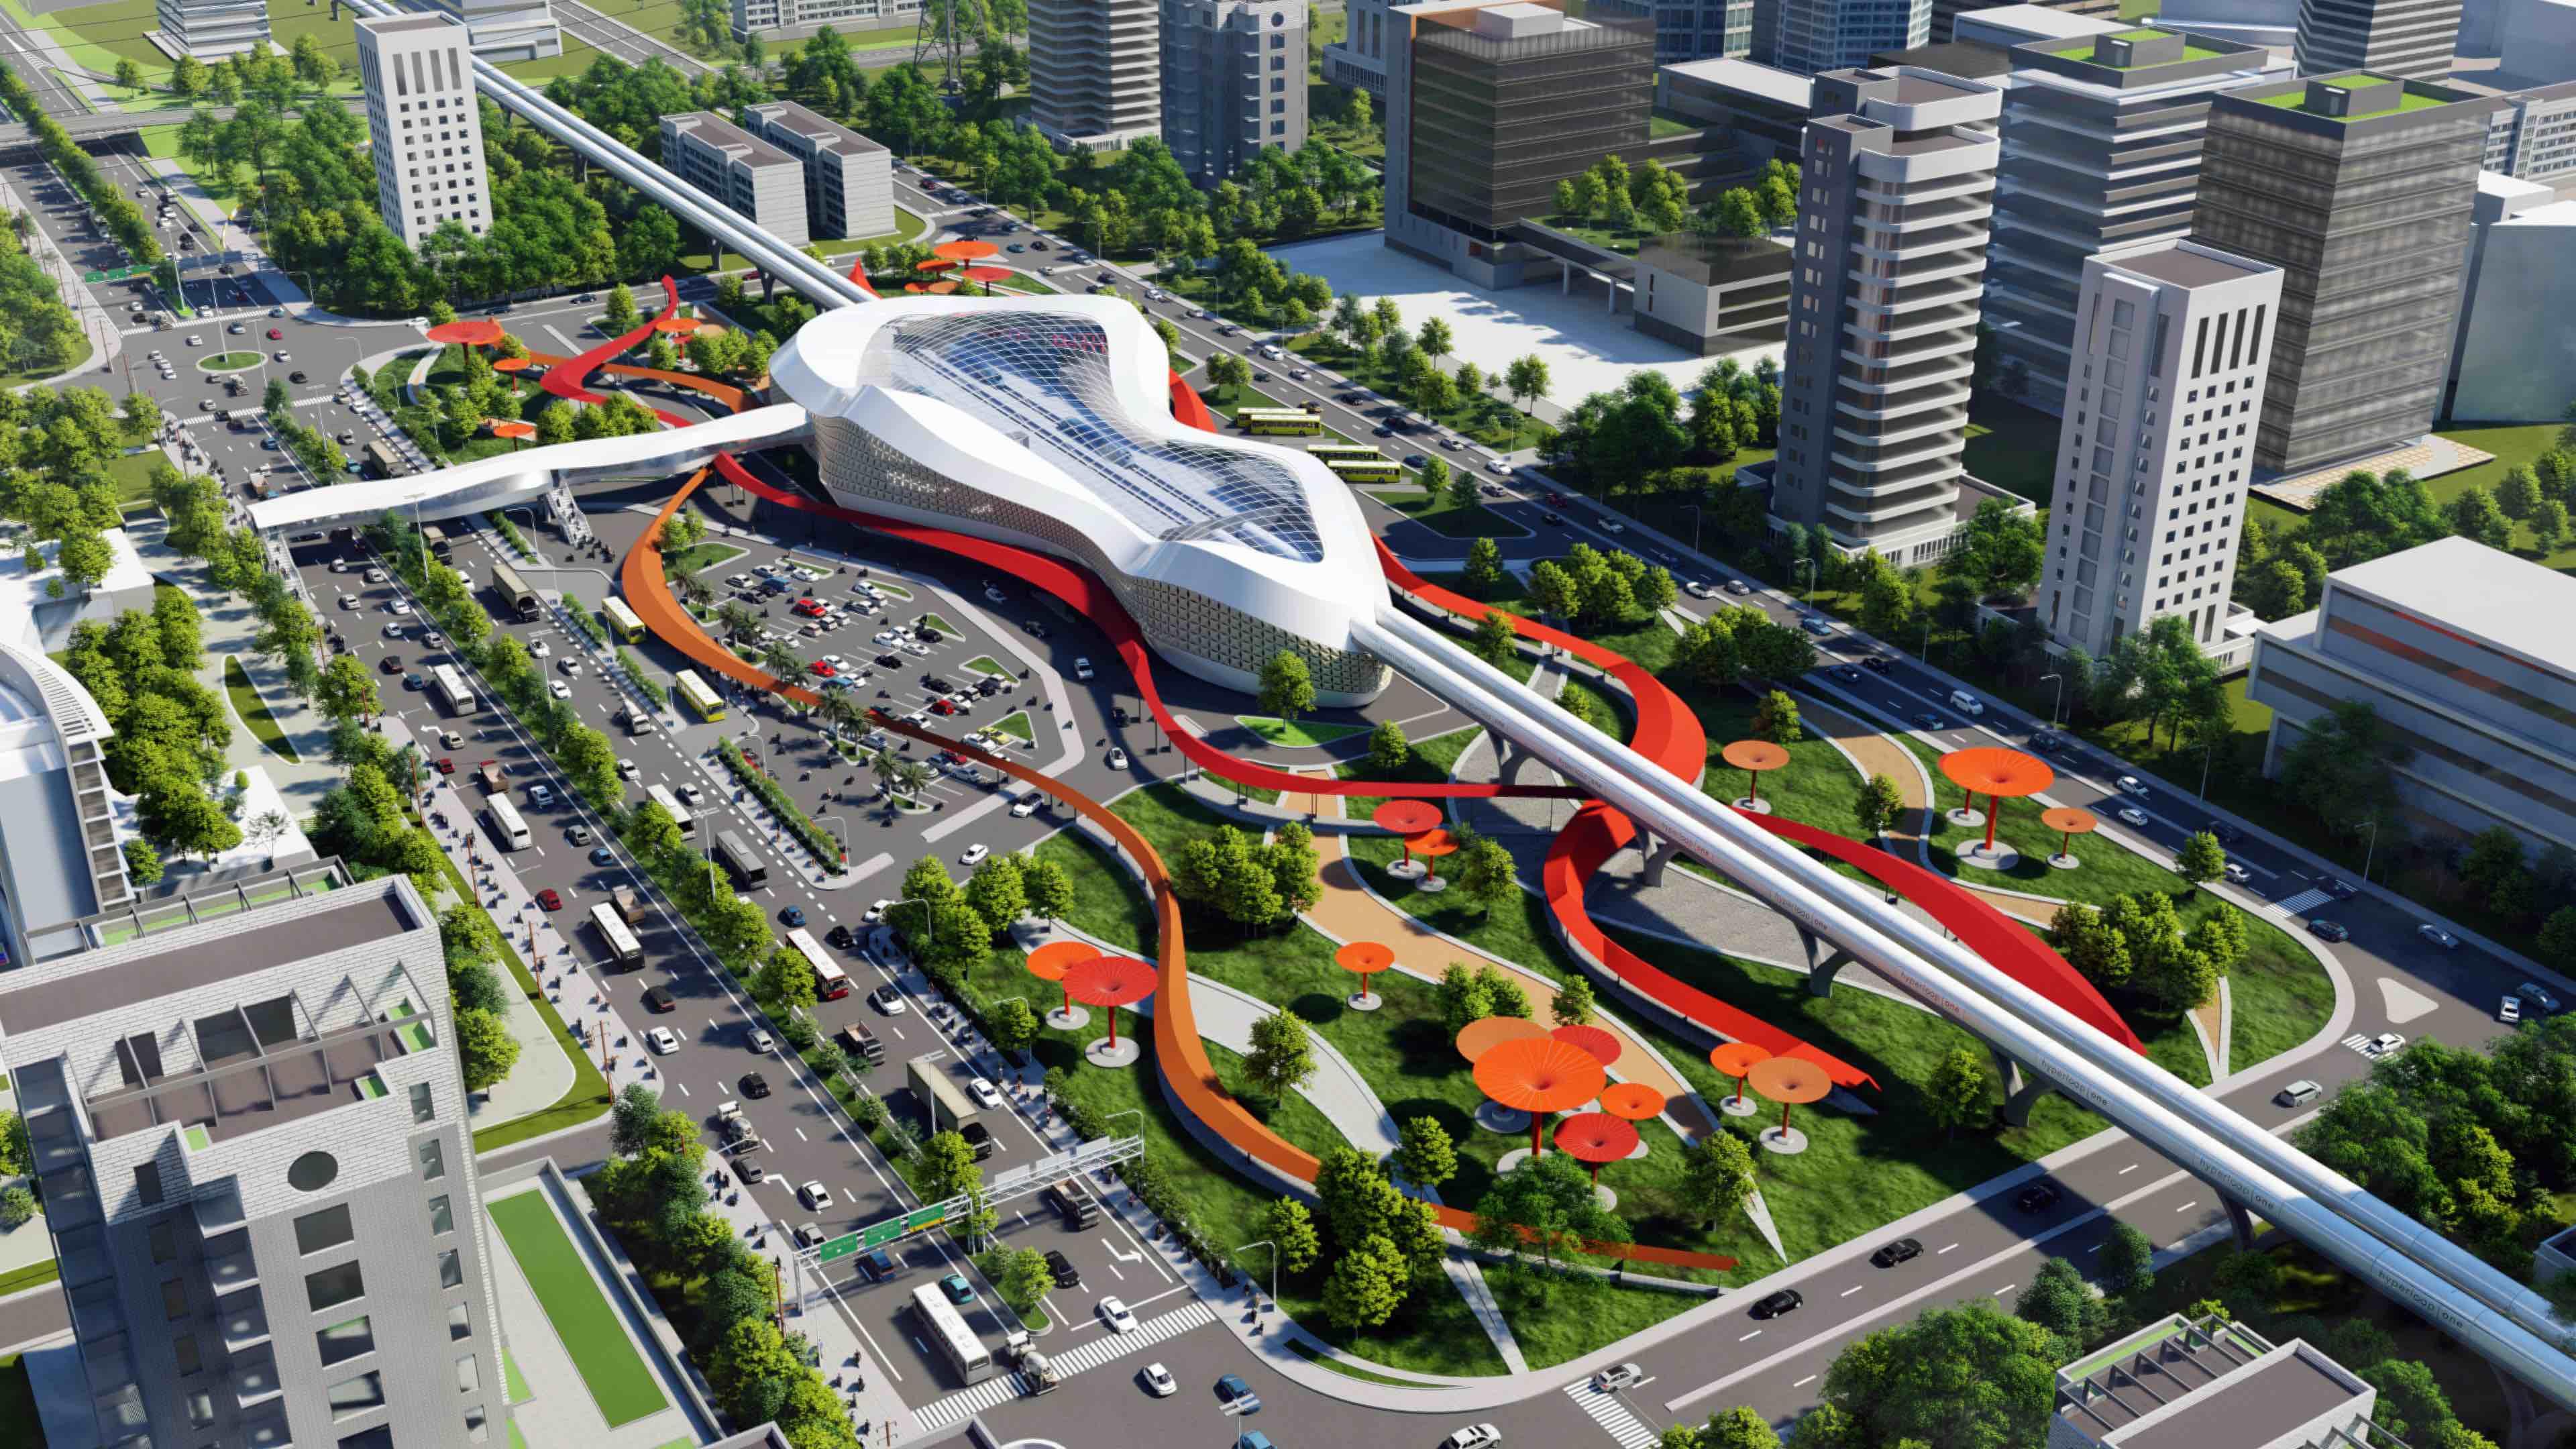 Hyperloop terminal designed by Astin John in Mumbai India